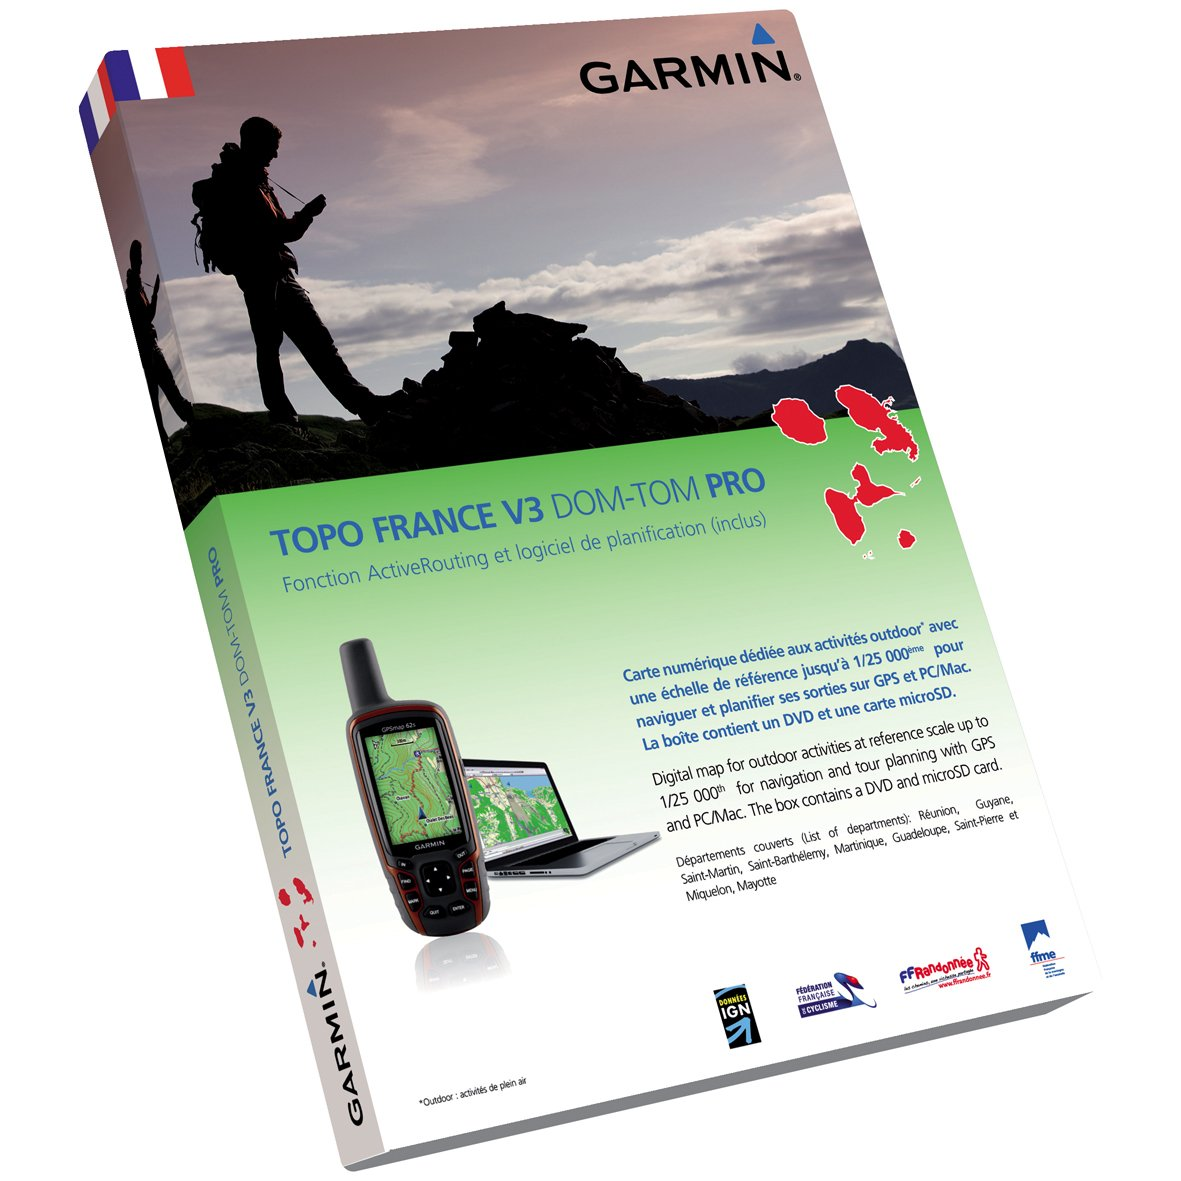 carte topo gps garmin france v3 pro 2012